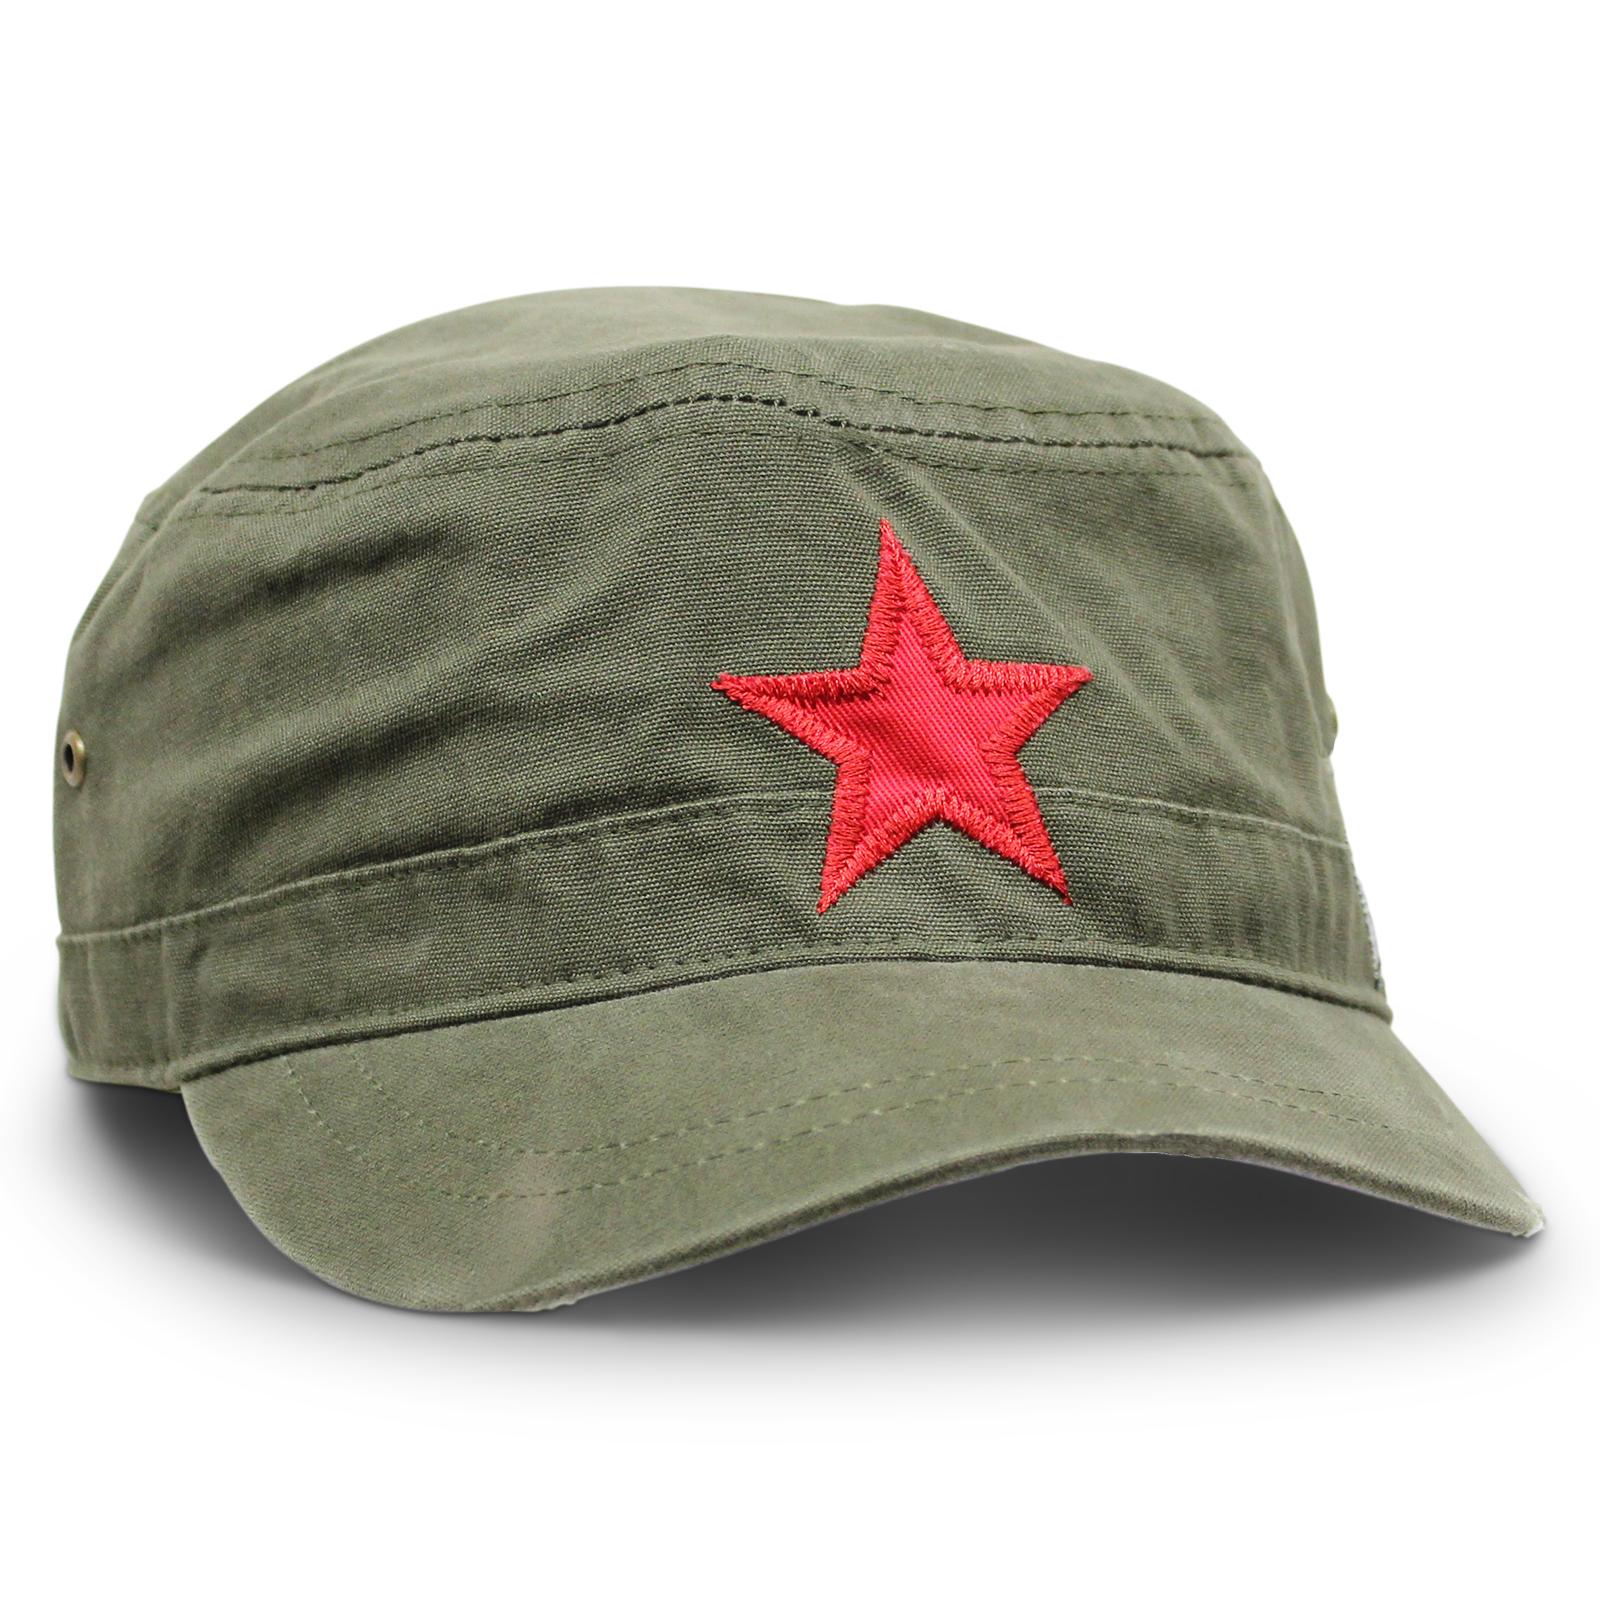 c61f169b77091 Red Star Hat - Olive - CLOTHING-Hats - Headwear-Summer   Mitchells ...